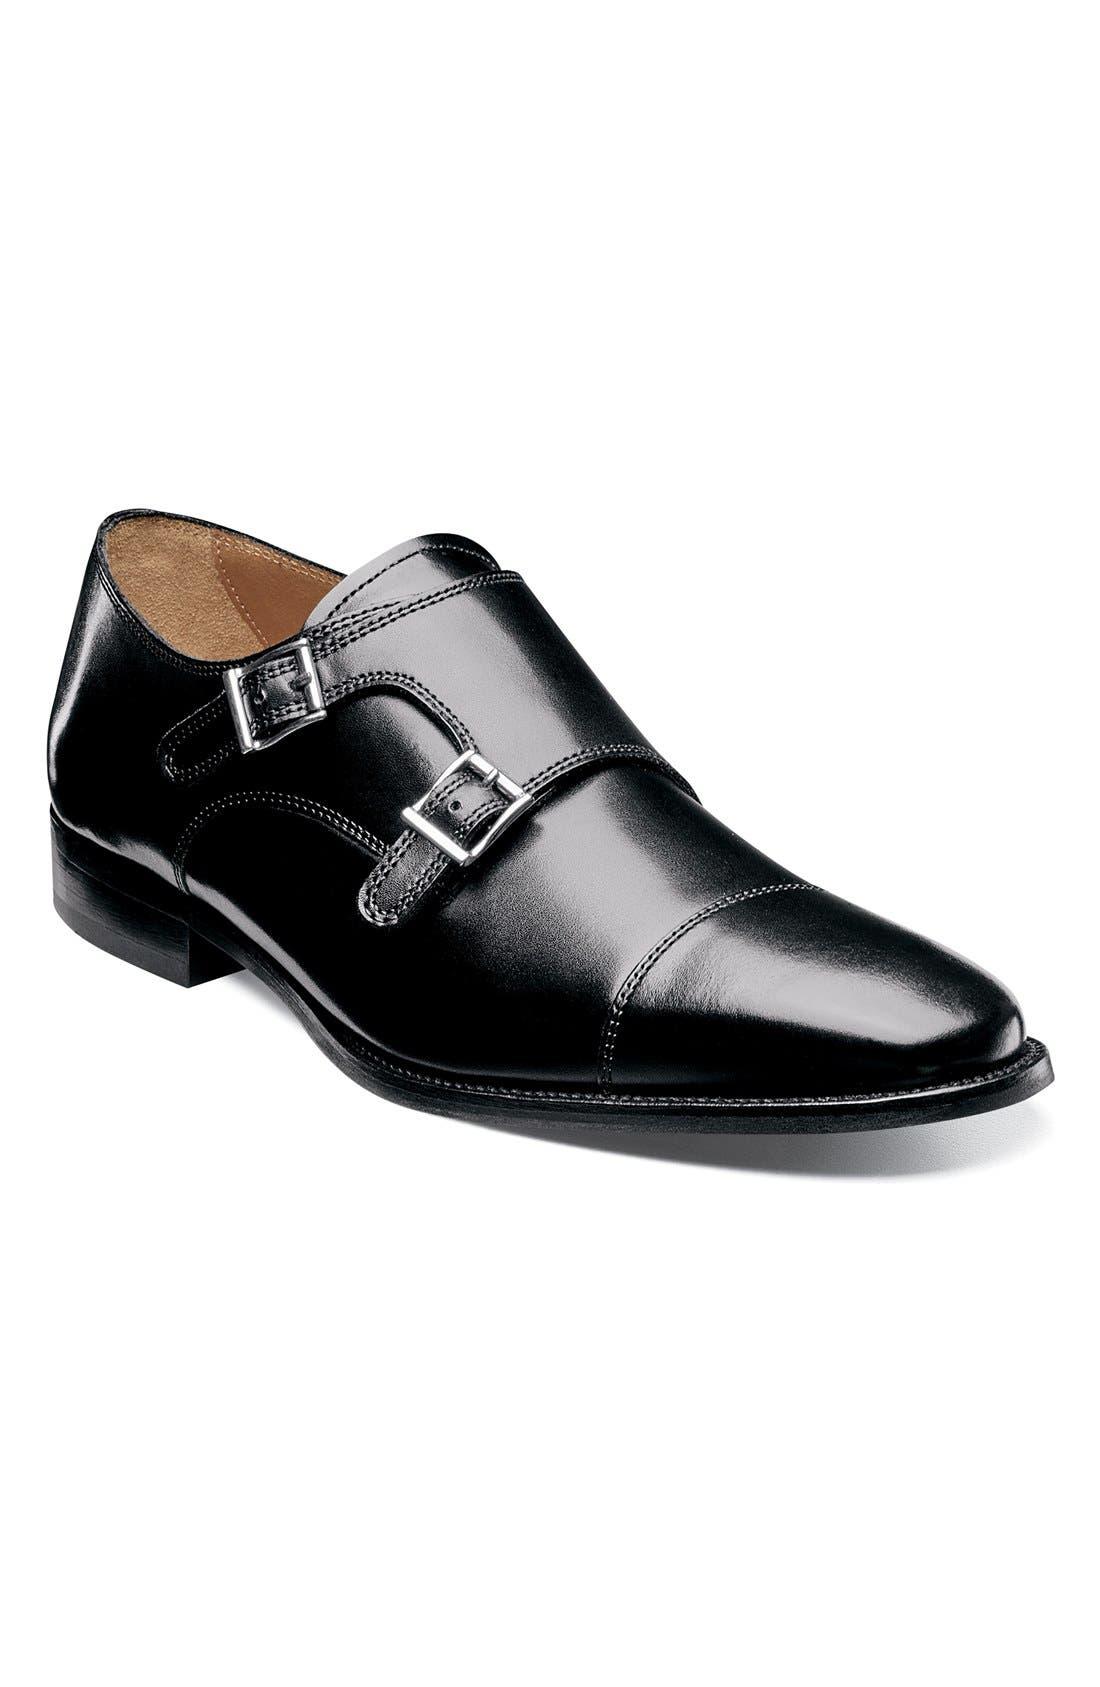 'Sabato' Double Monk Strap Shoe,                             Main thumbnail 1, color,                             001